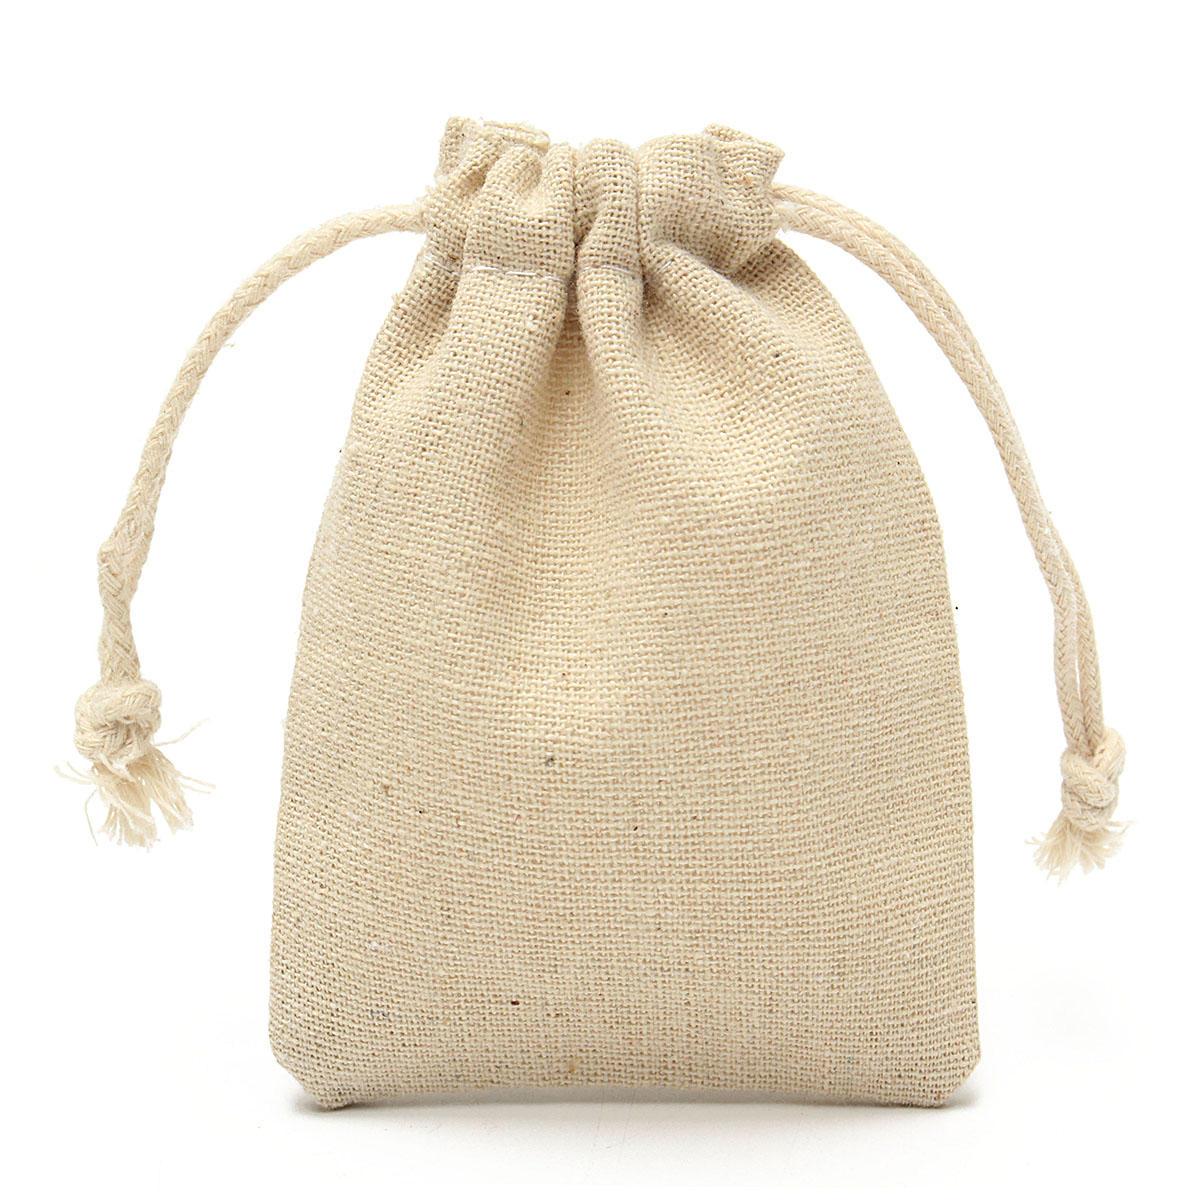 30pcs Natural Linen Pouch Burlap Jute Sack Jewelry Drawstring Gift Bags 8x10cm